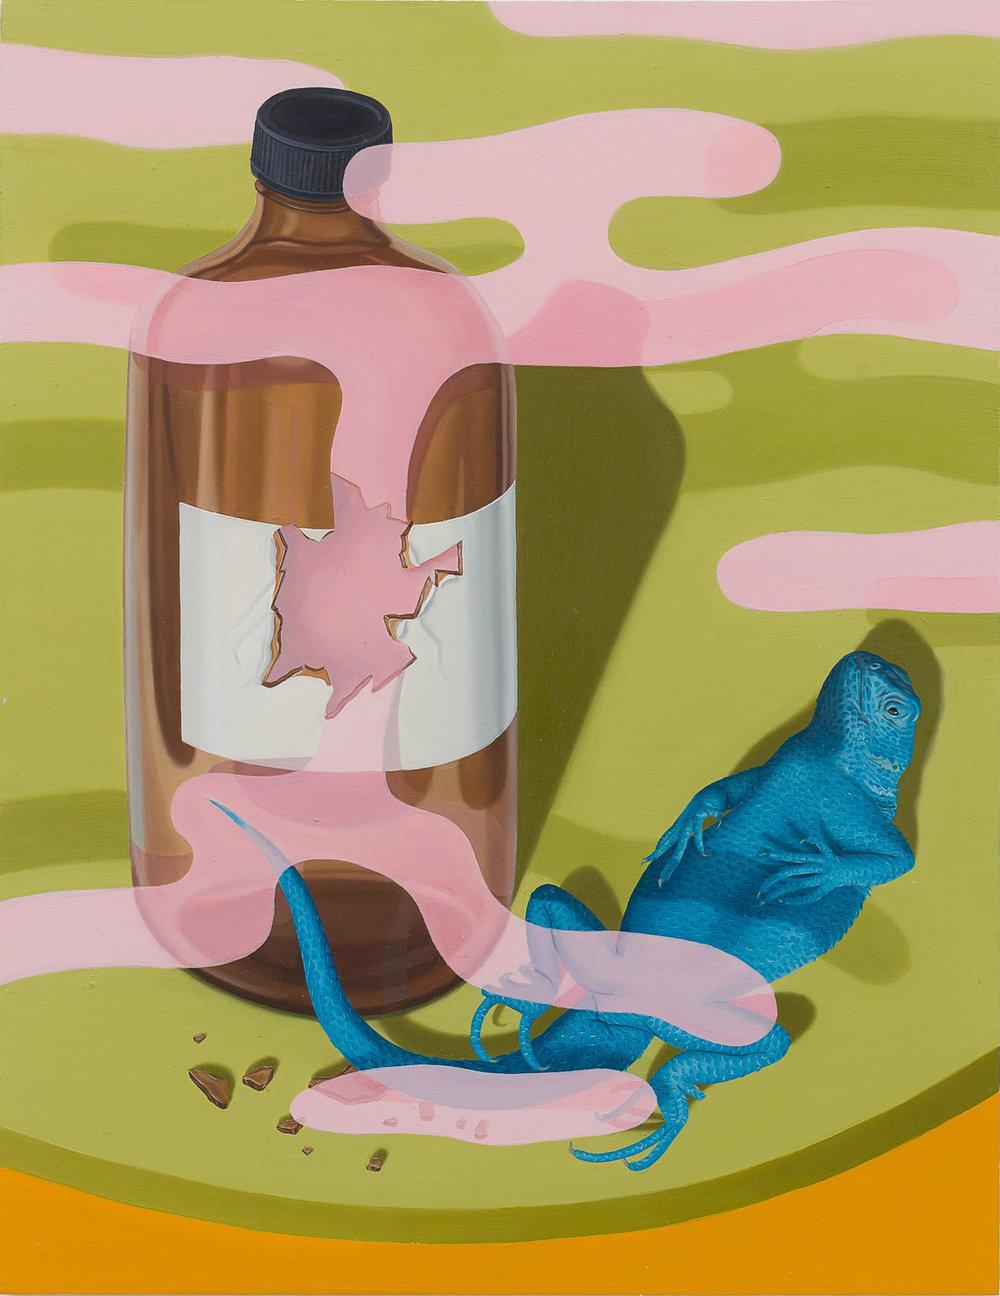 Tristan Pigott  Apparent Death,  2018 Oil on board  27.5 x 21.5 cm